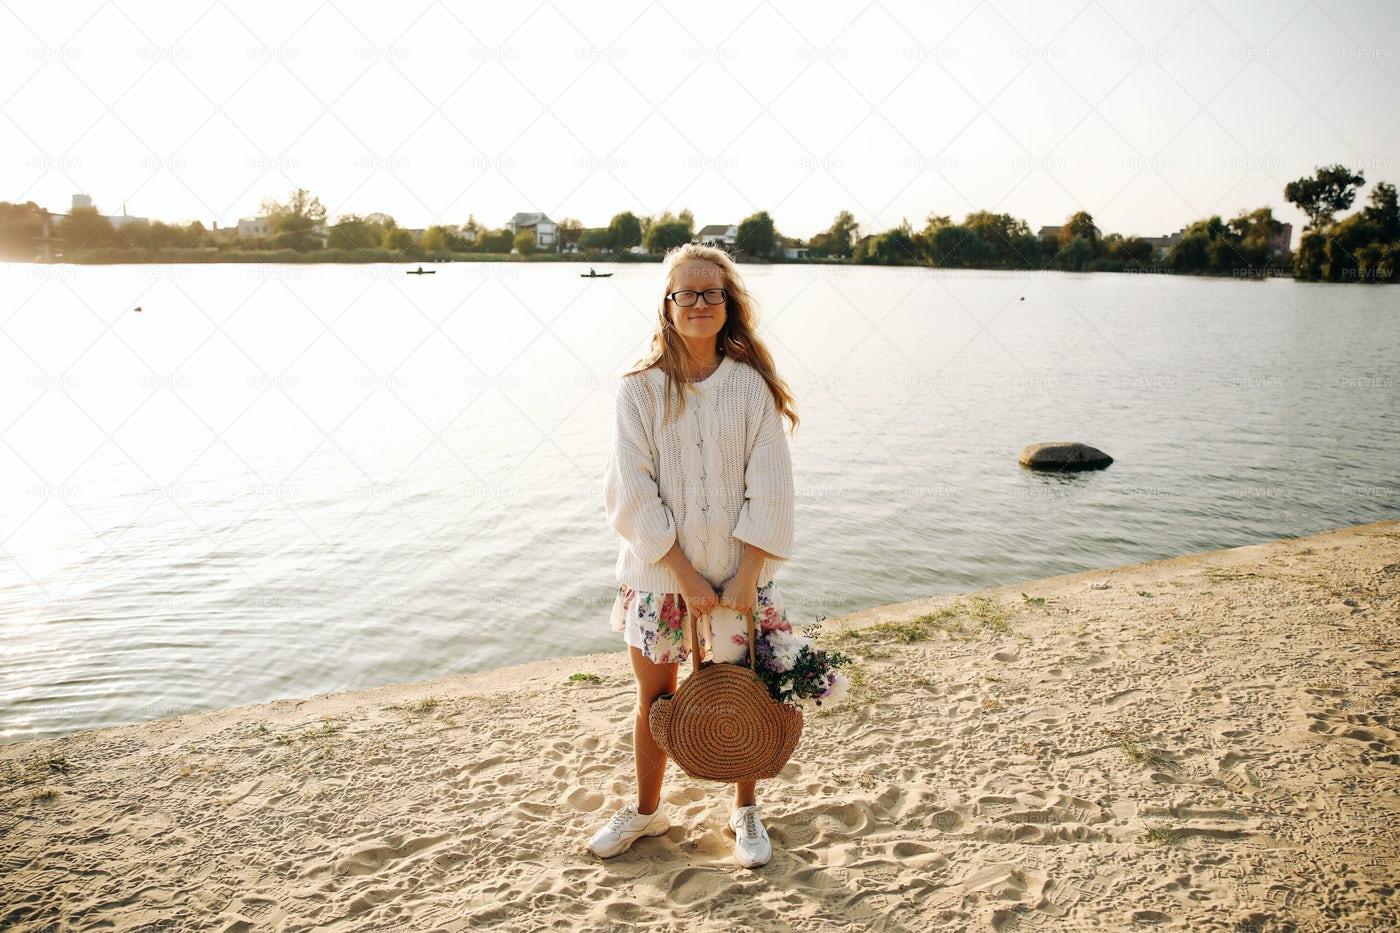 Girl On The Beach In Autumn: Stock Photos